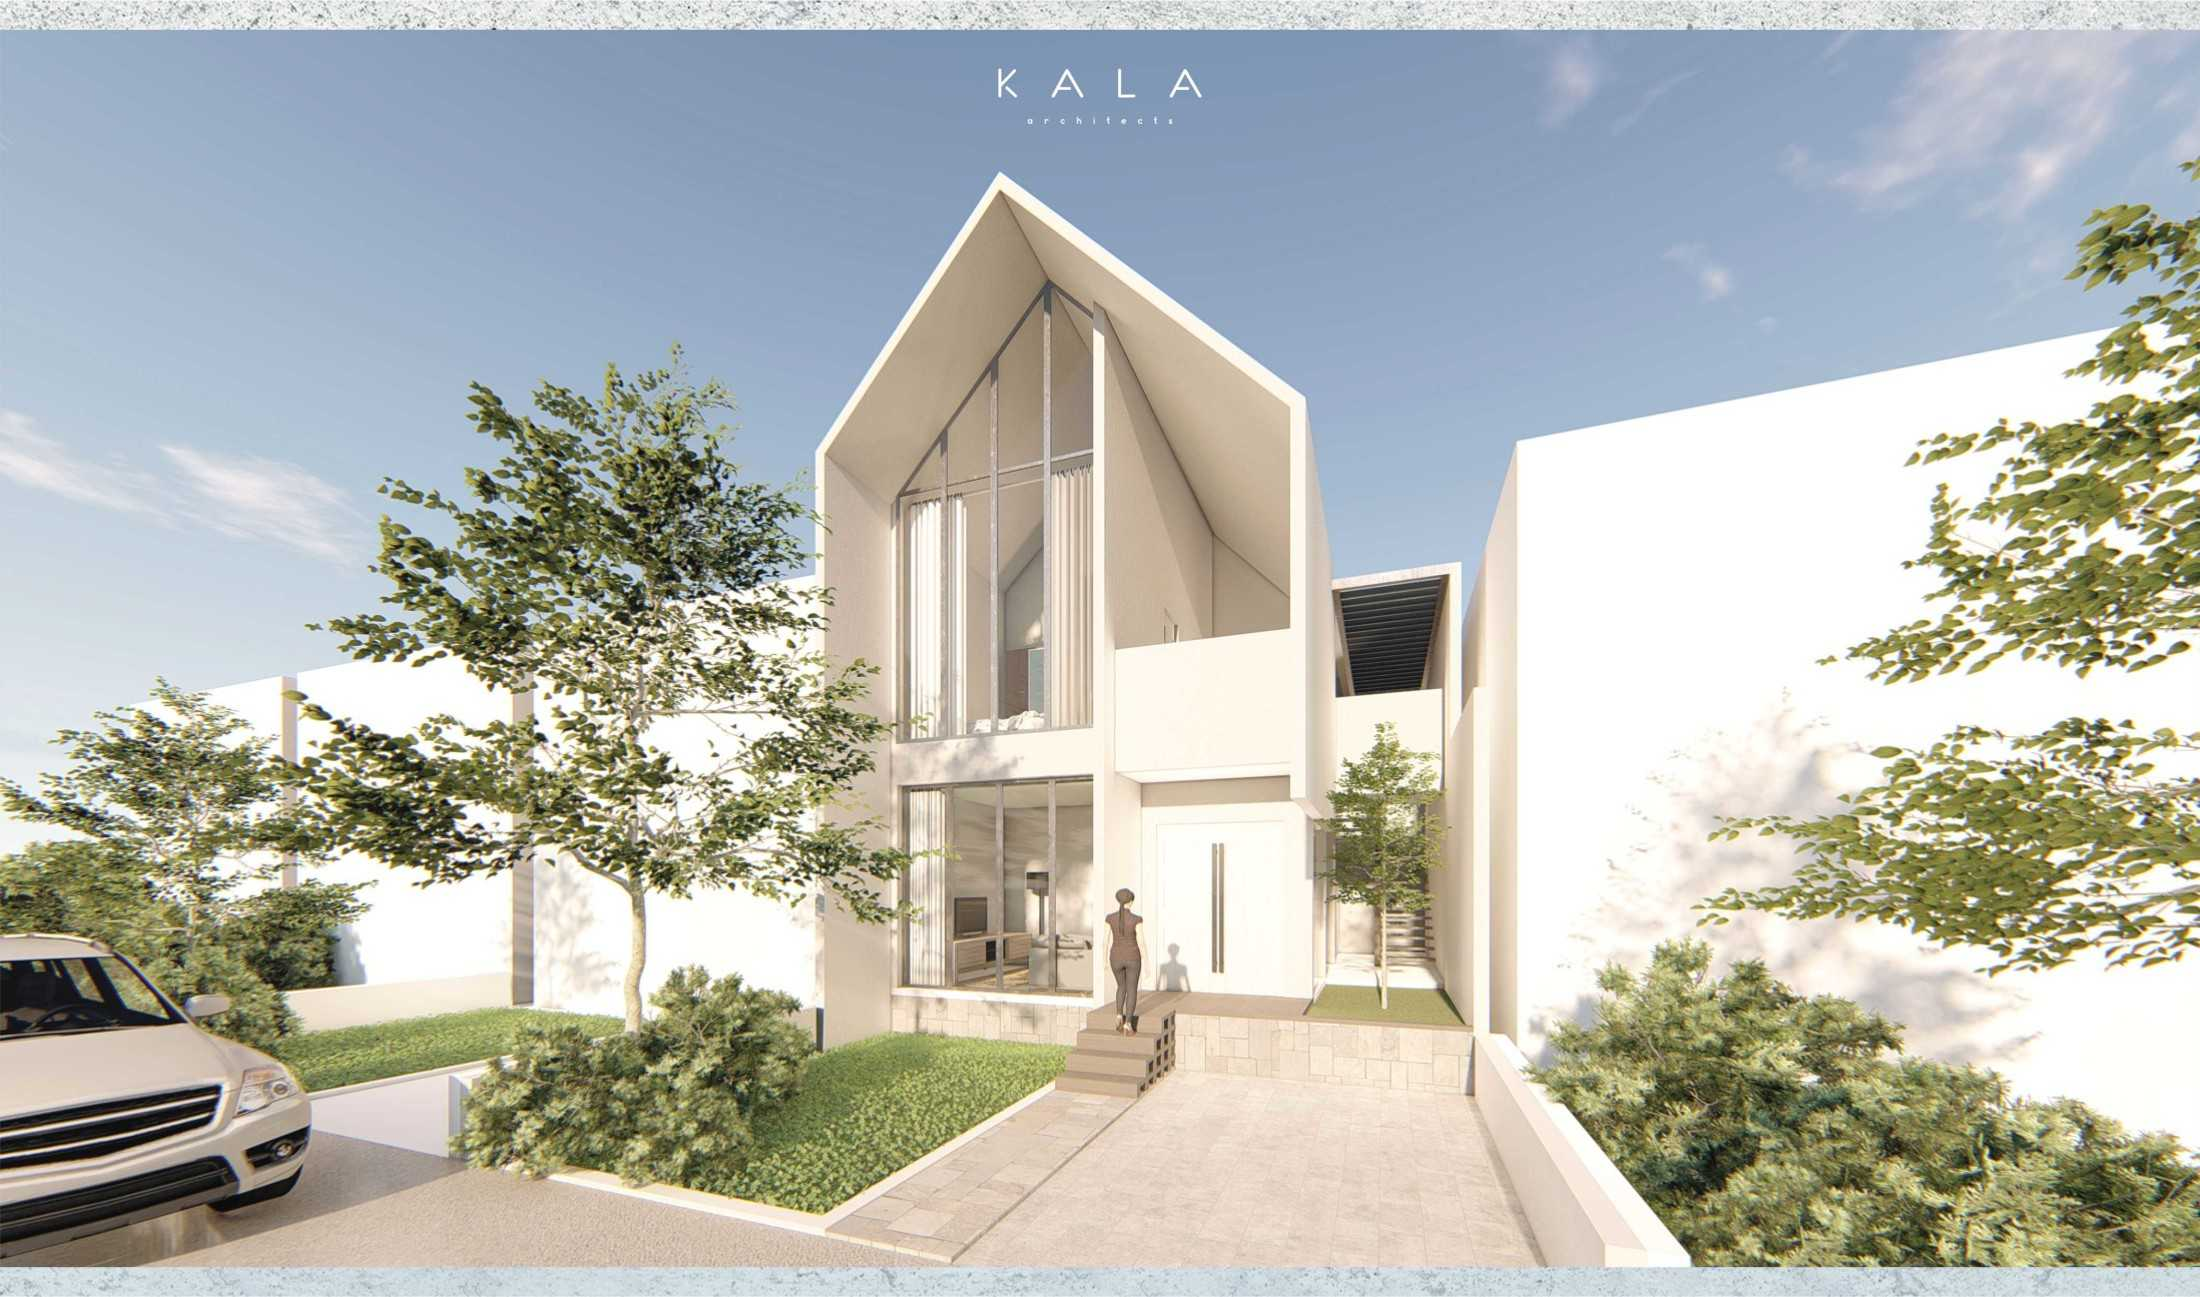 Kala Penta House Modern Jakarta Selatan, Kota Jakarta Selatan, Daerah Khusus Ibukota Jakarta, Indonesia Jakarta Selatan, Kota Jakarta Selatan, Daerah Khusus Ibukota Jakarta, Indonesia Kala-Penta-House-Modern  74461